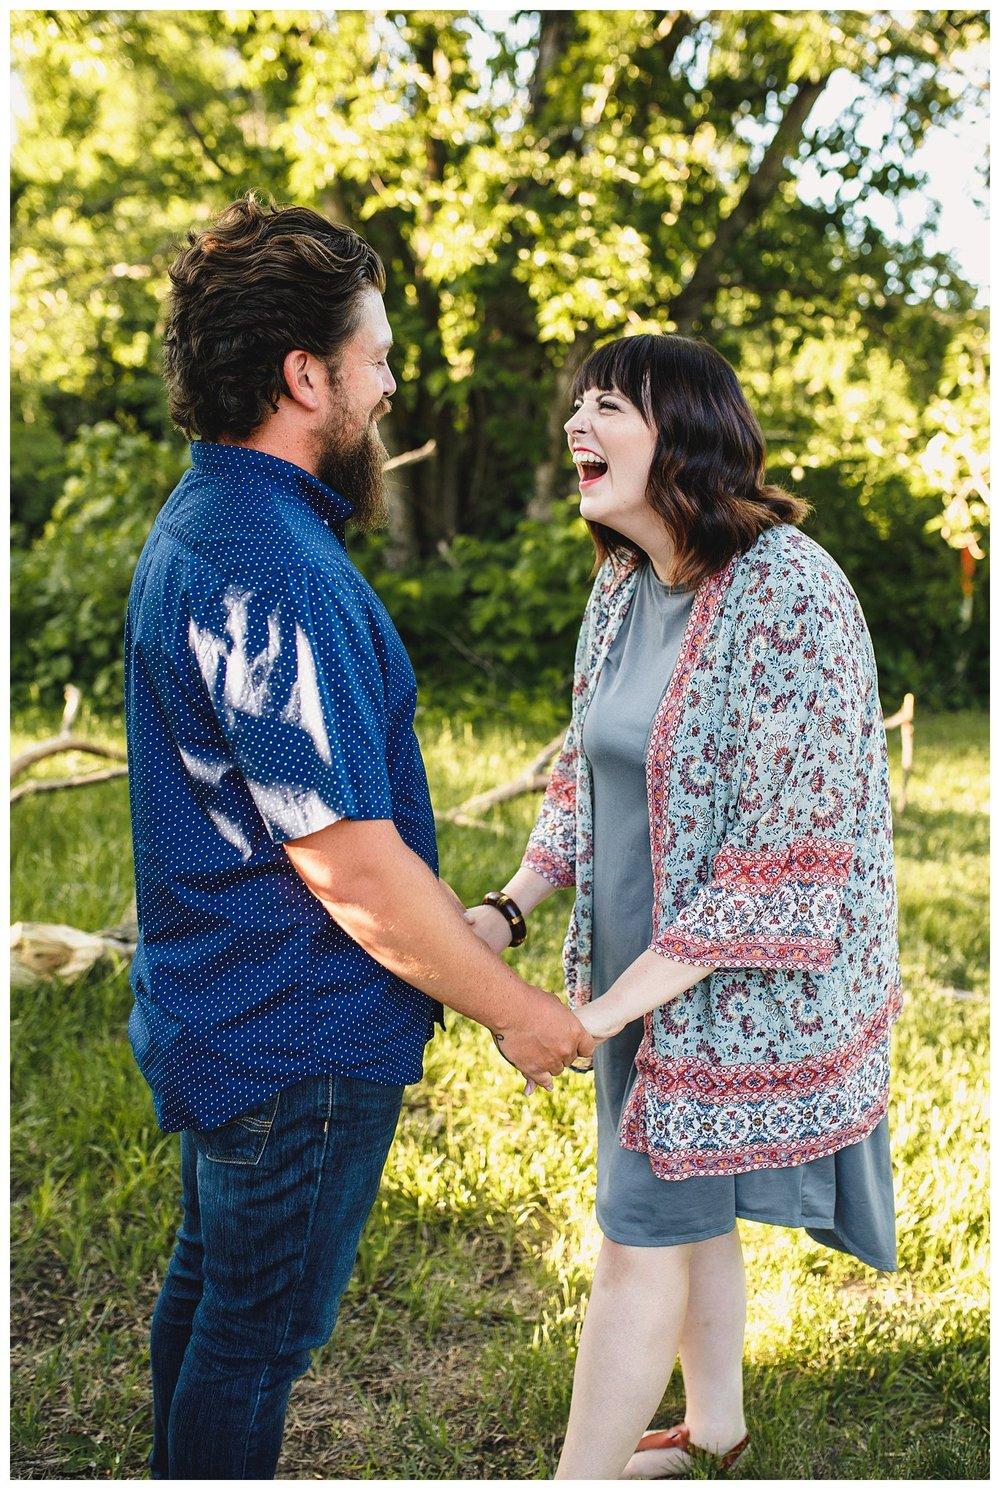 Kelsey_Diane_Photography_Kansas_City_Engagement_Wedding_Photographer_Midwest_Traveling_Missouri_Chris_Taylor_0770.jpg